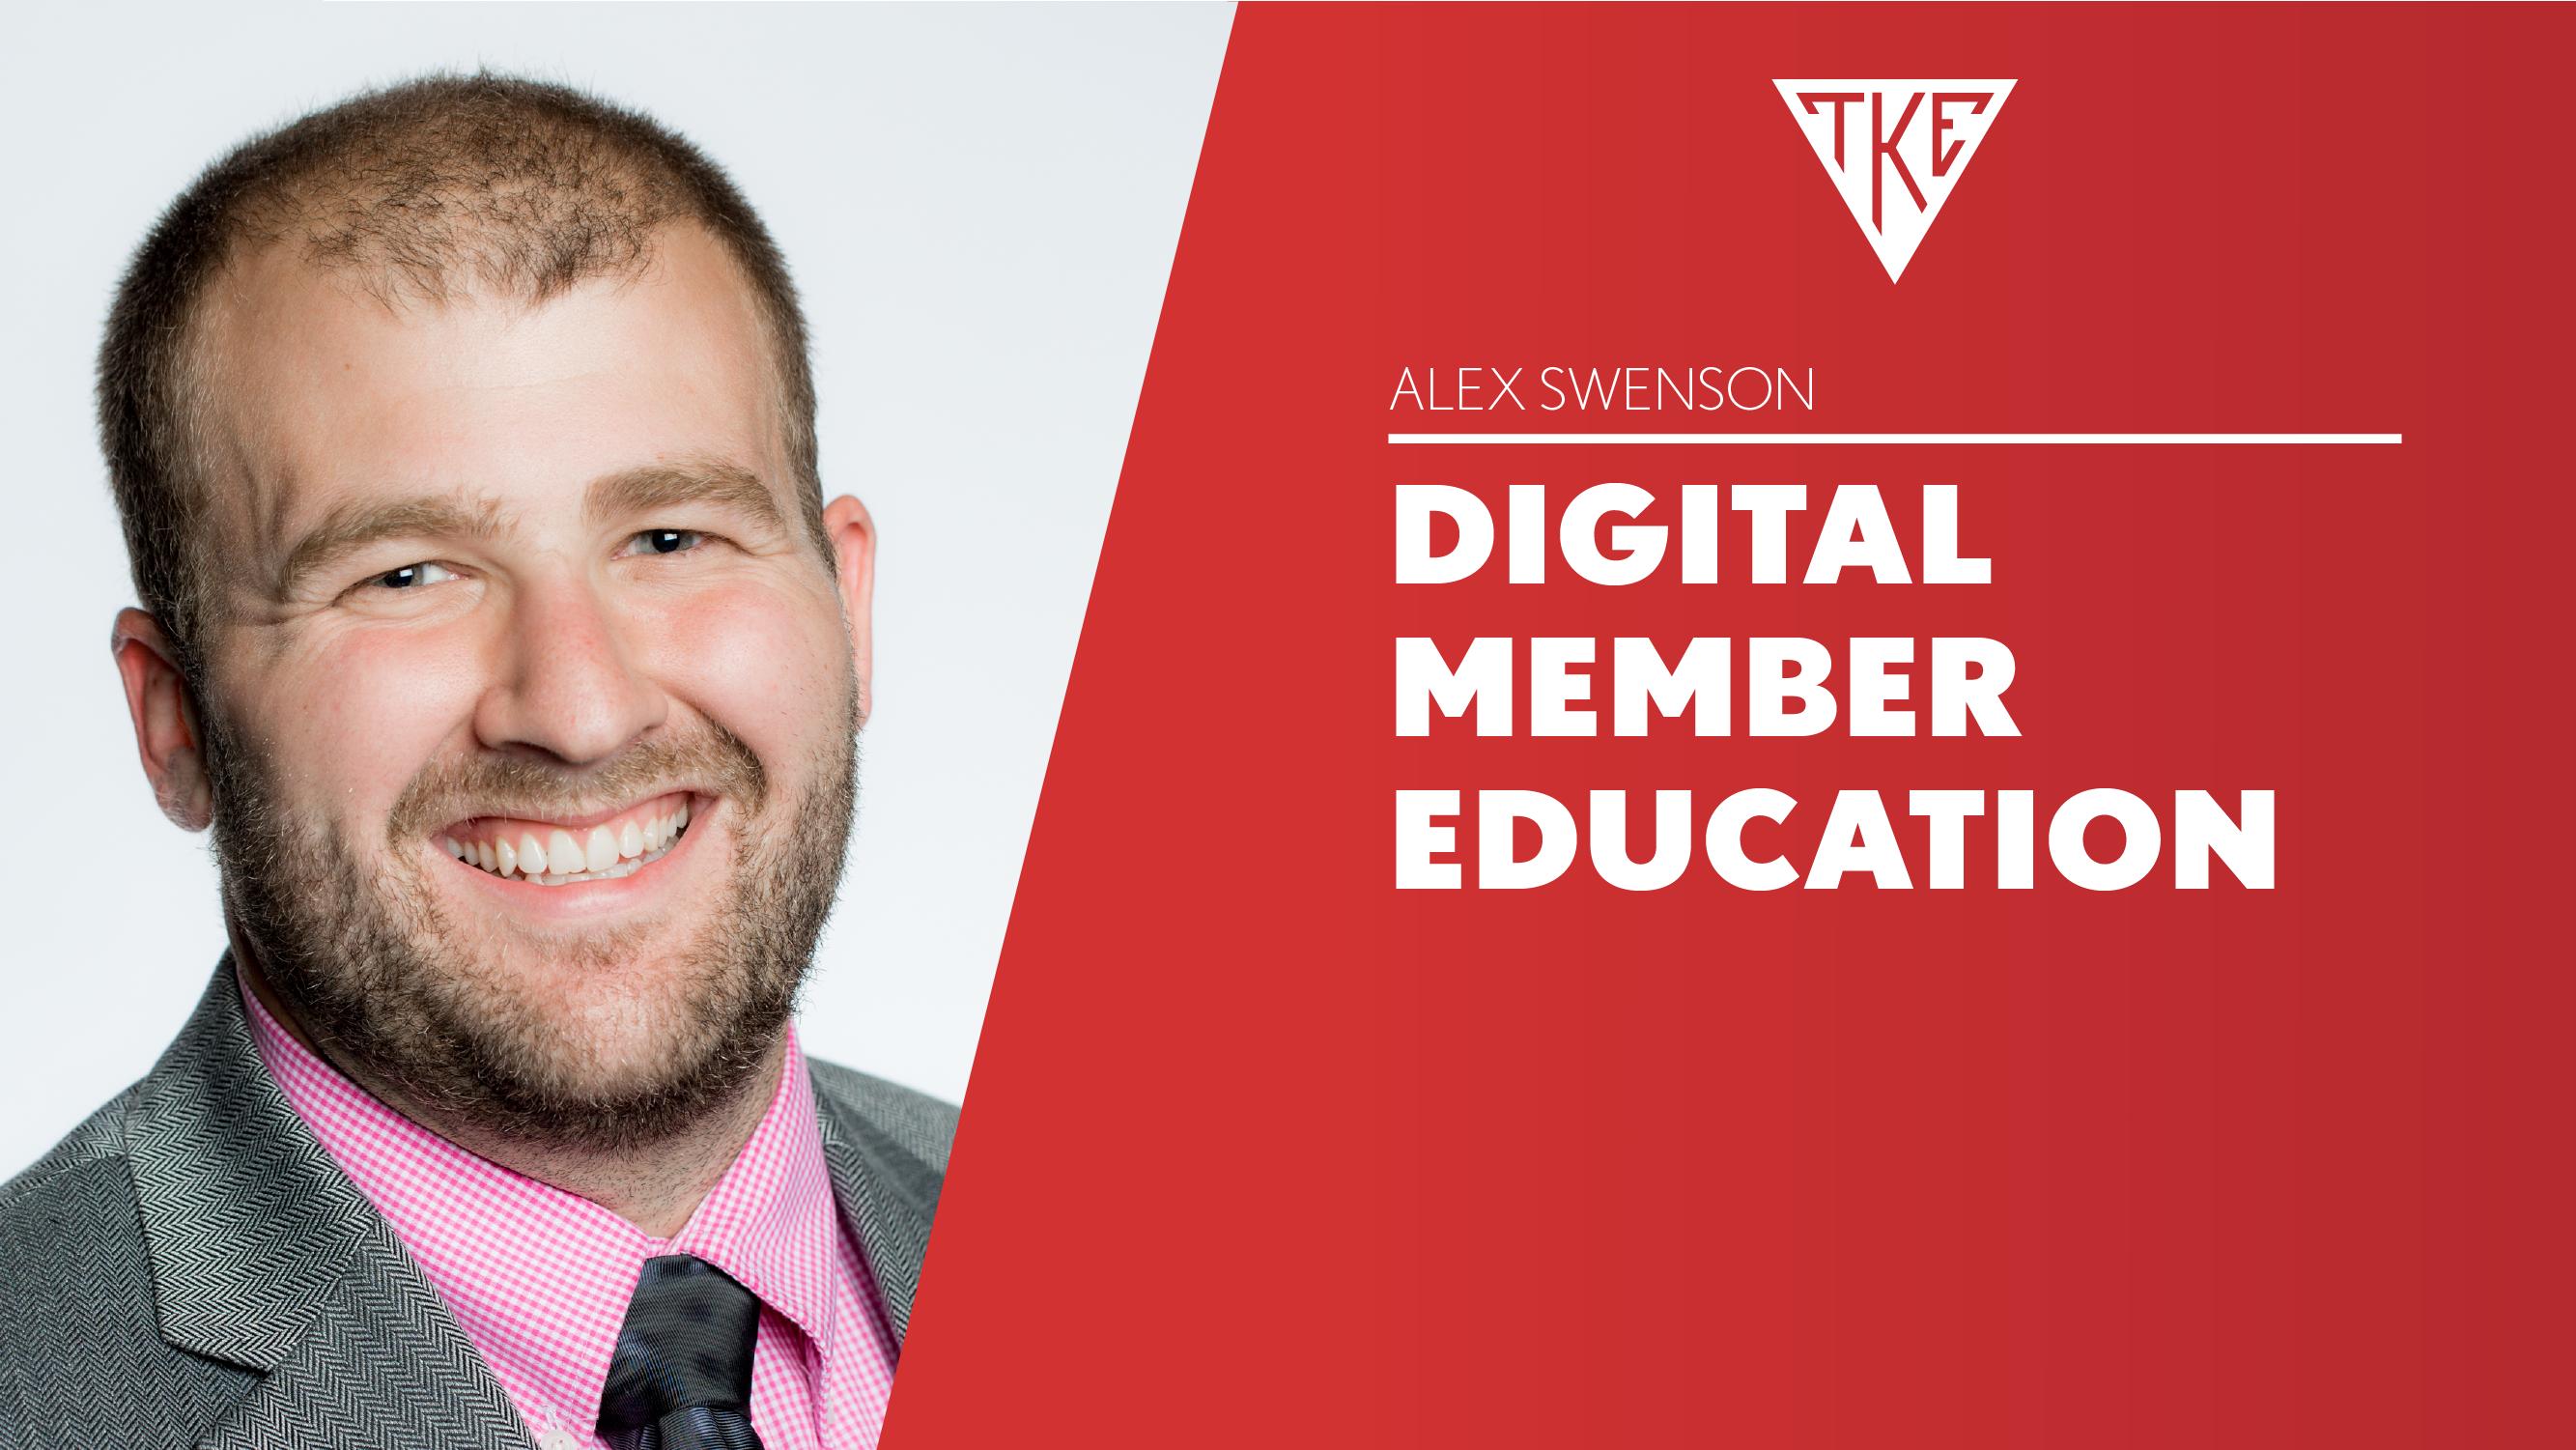 Digital Member Education